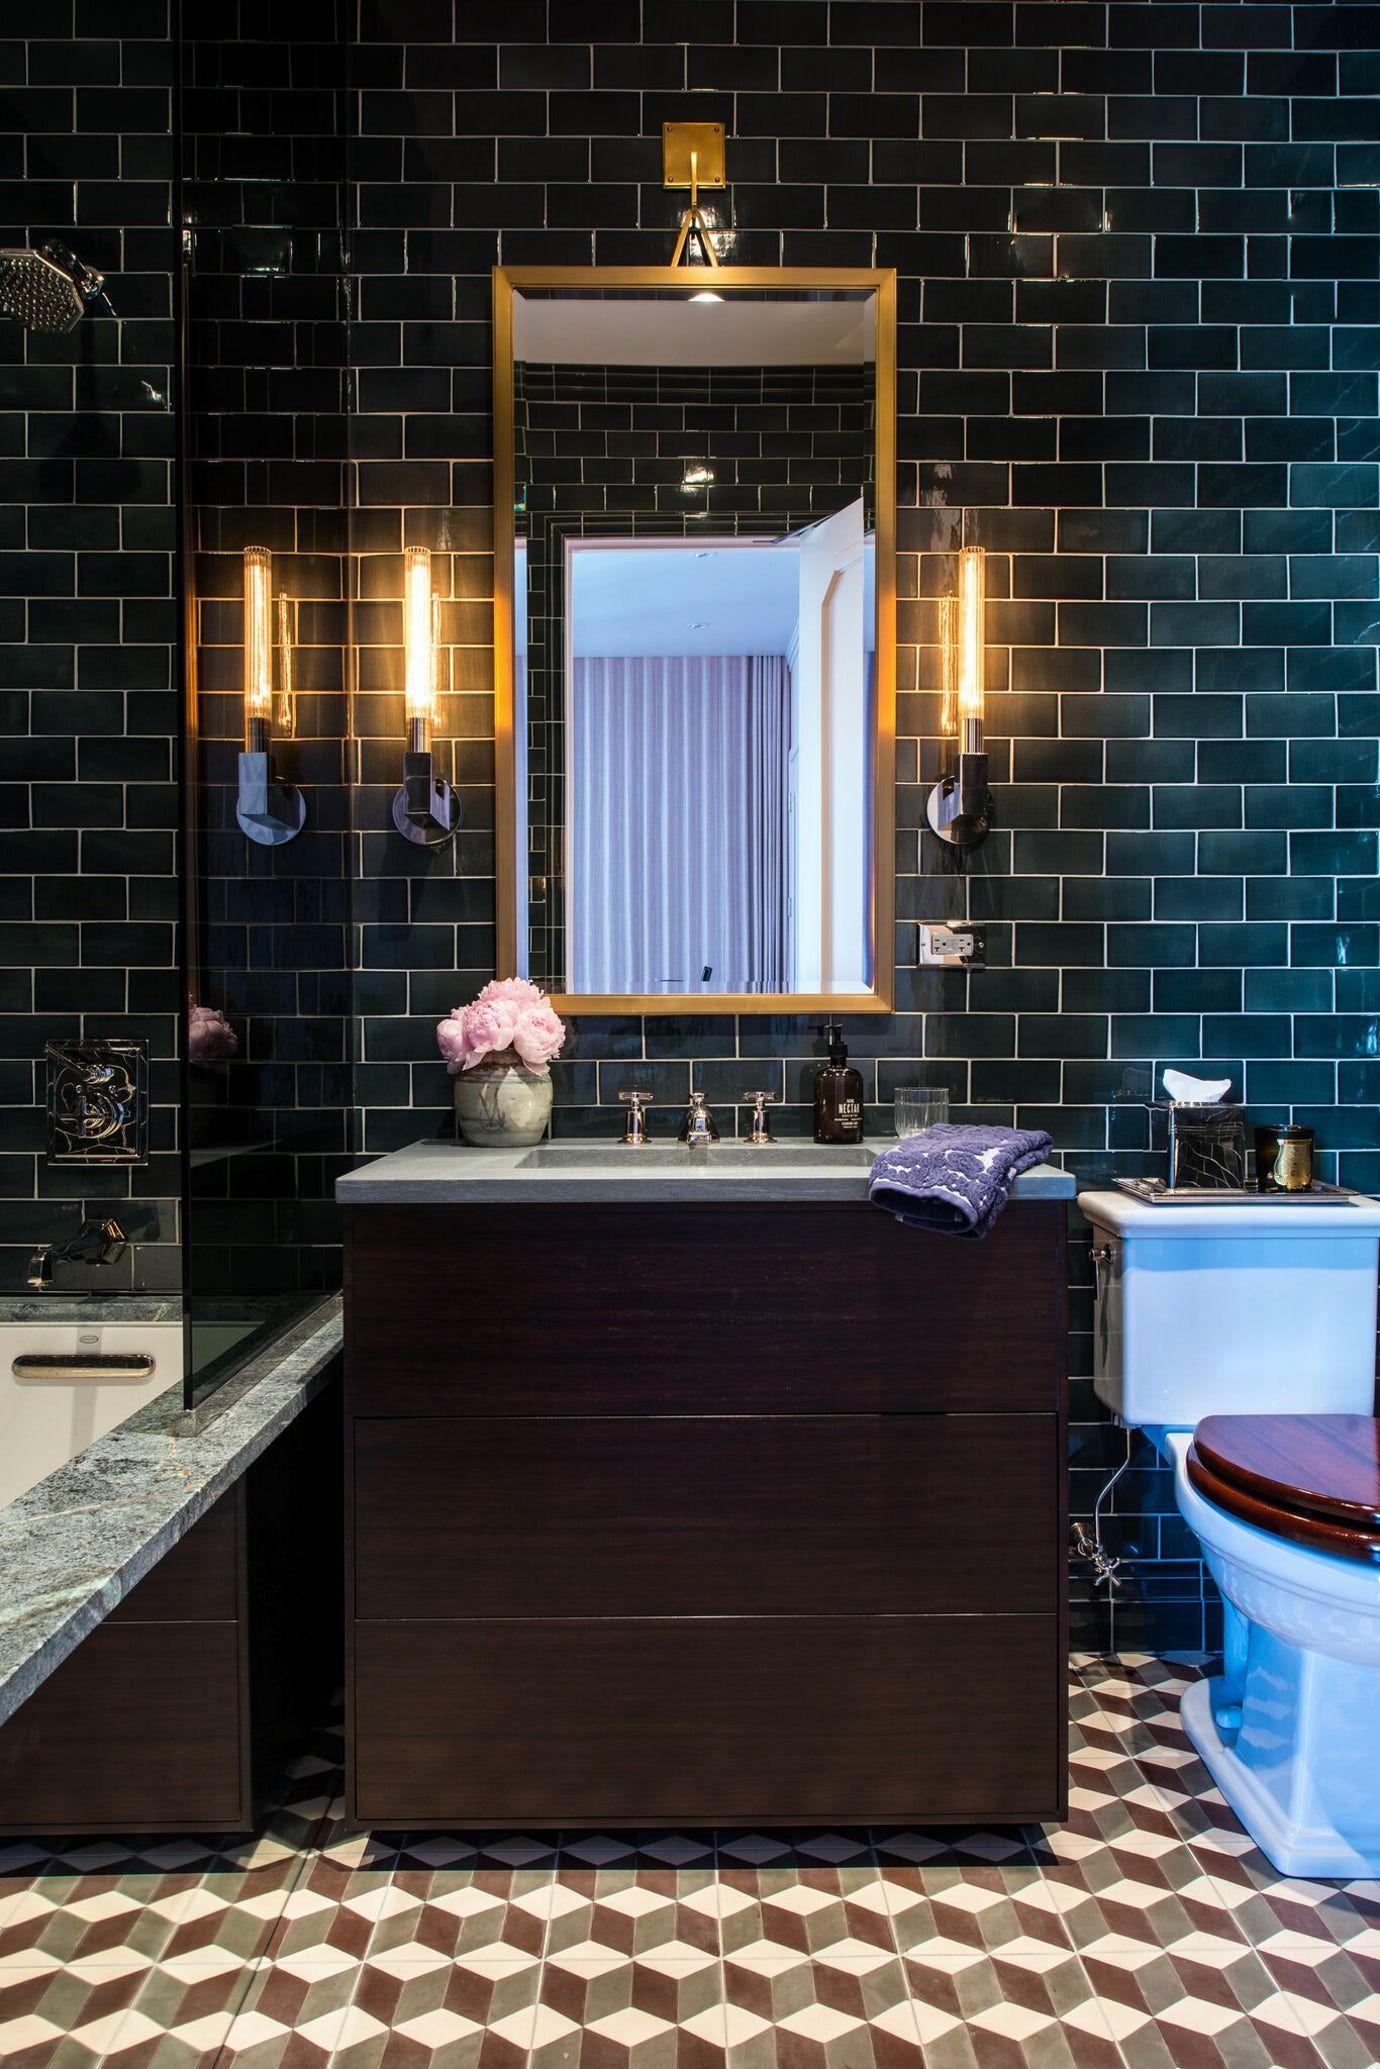 Guest Bathroom With Teal Subway Tile Pattern Cement Floors Modern Sconces Bath Eclectic By Studio Cak Interior Design Portfolios Modern Sconces Interior